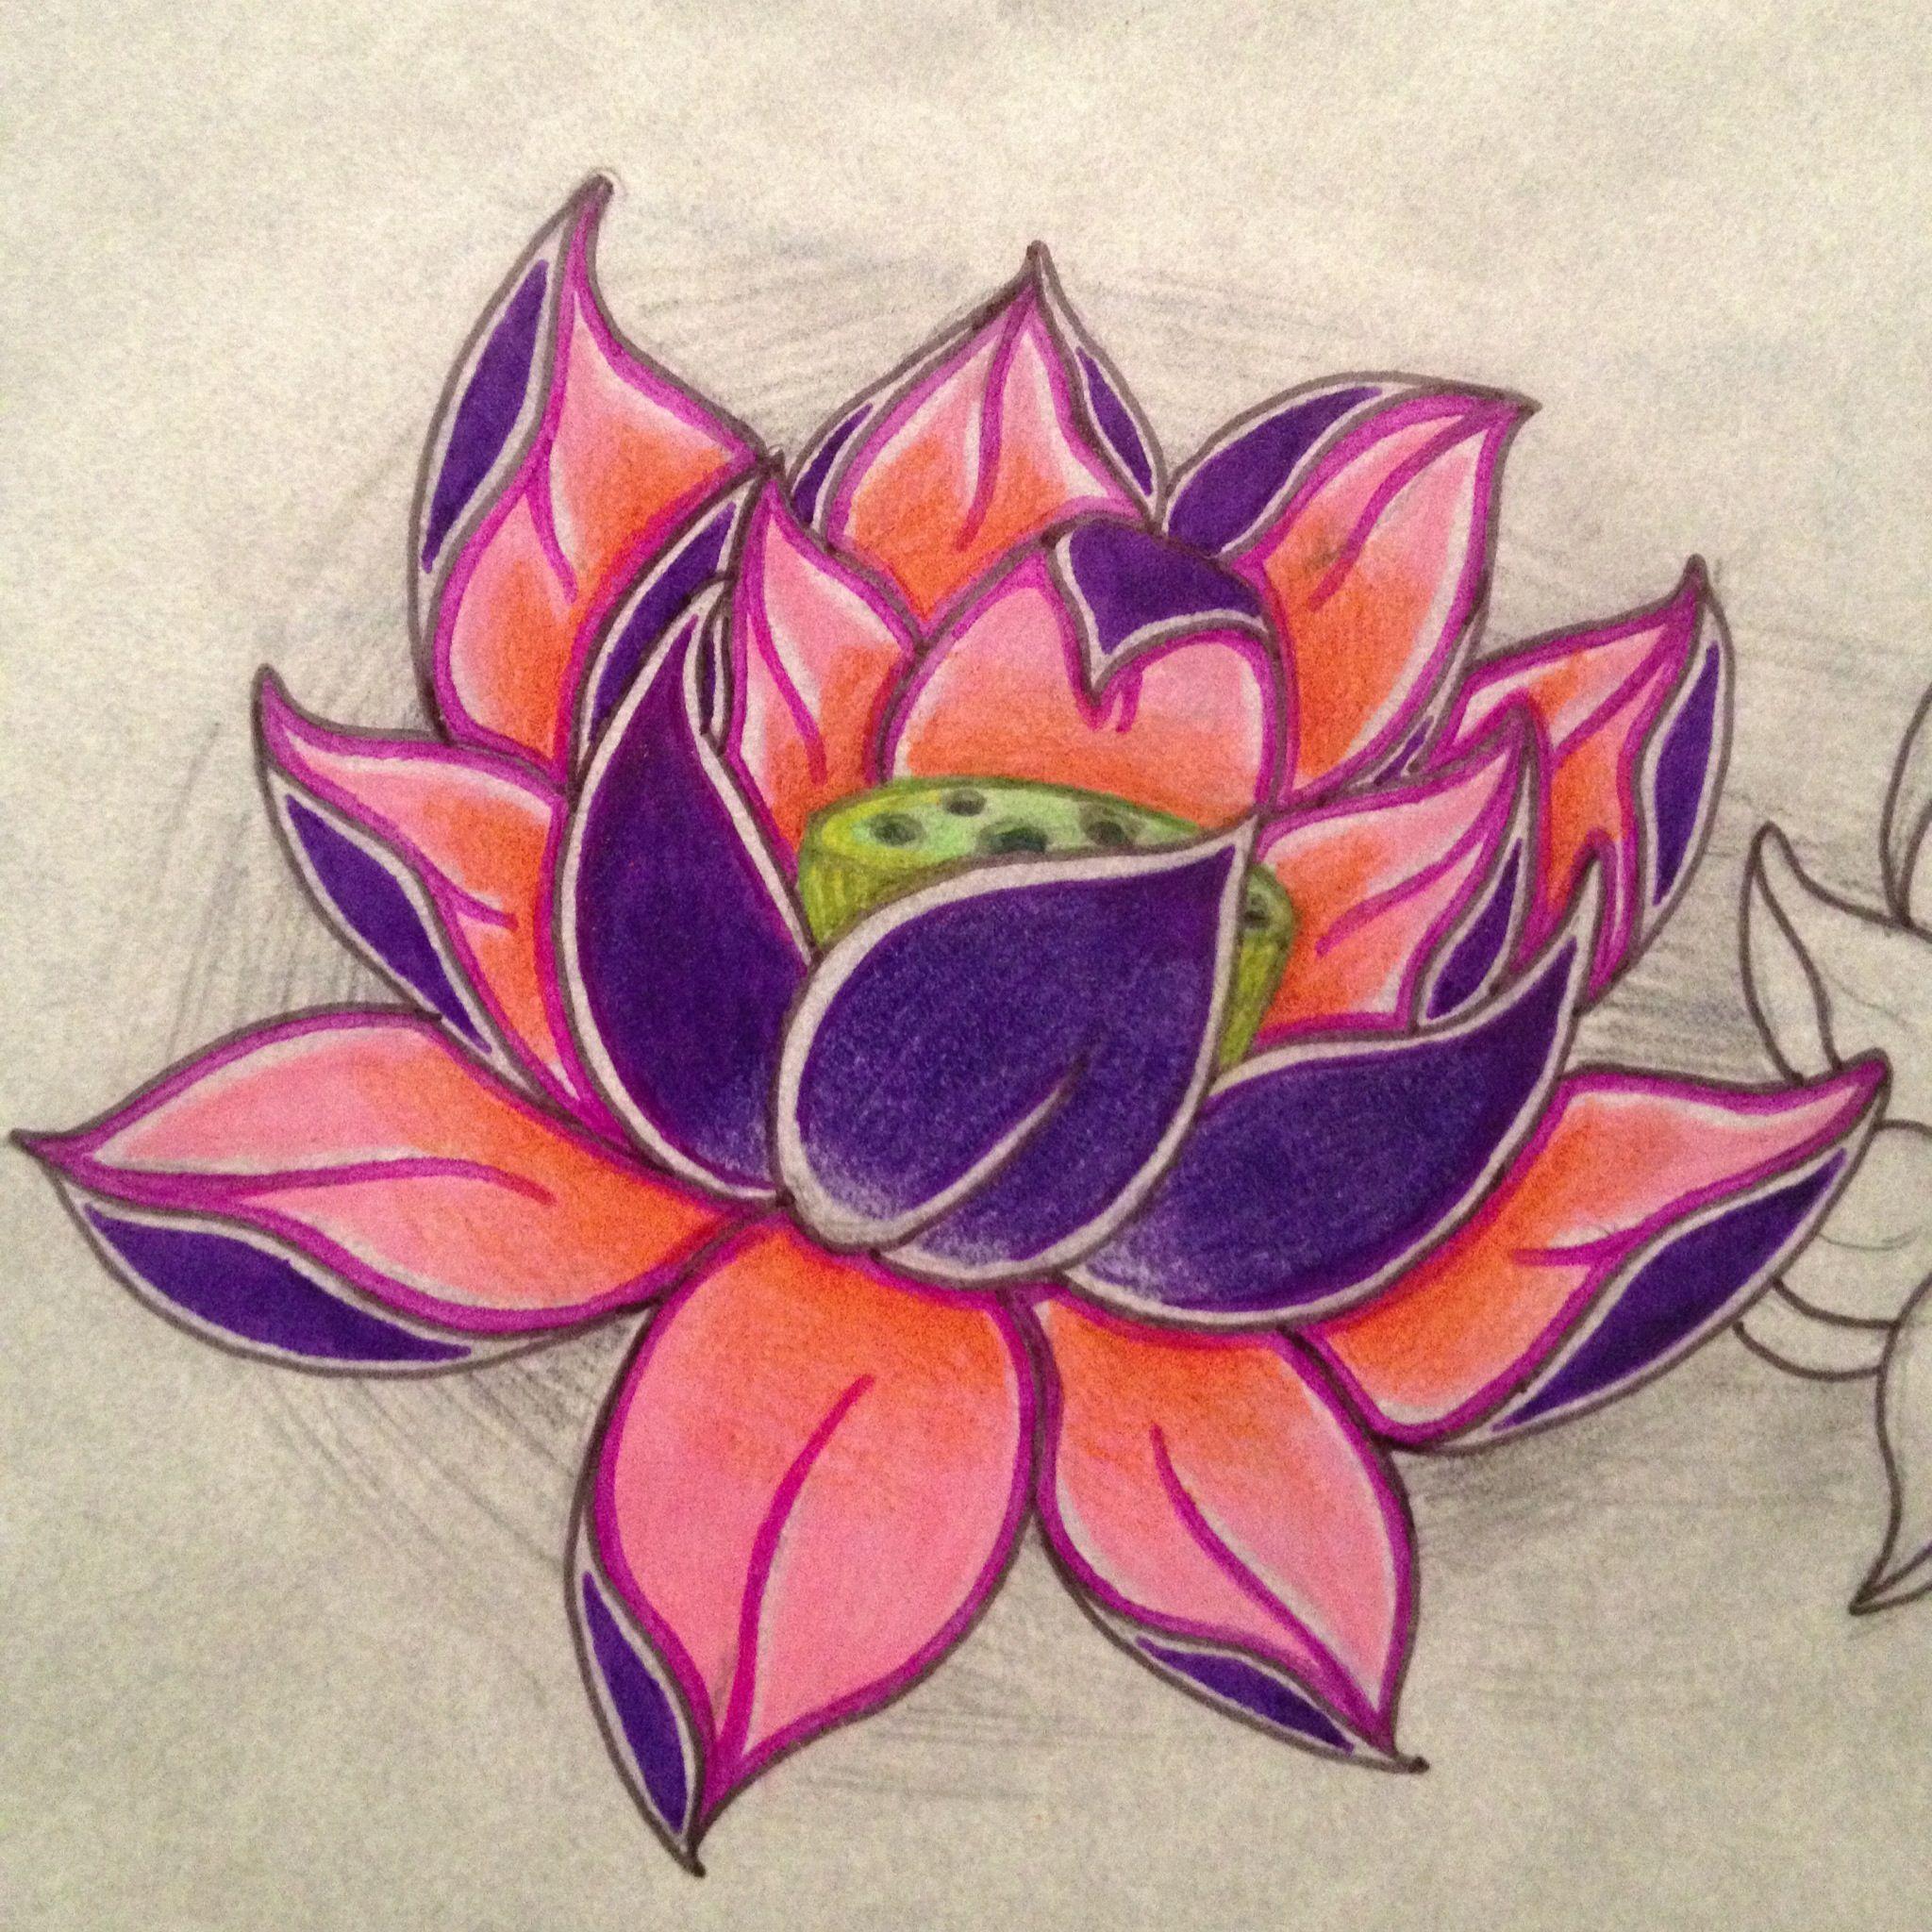 Lotus flower sharpie and color pencil art pinterest lotus flower lotus flower sharpie and color pencil izmirmasajfo